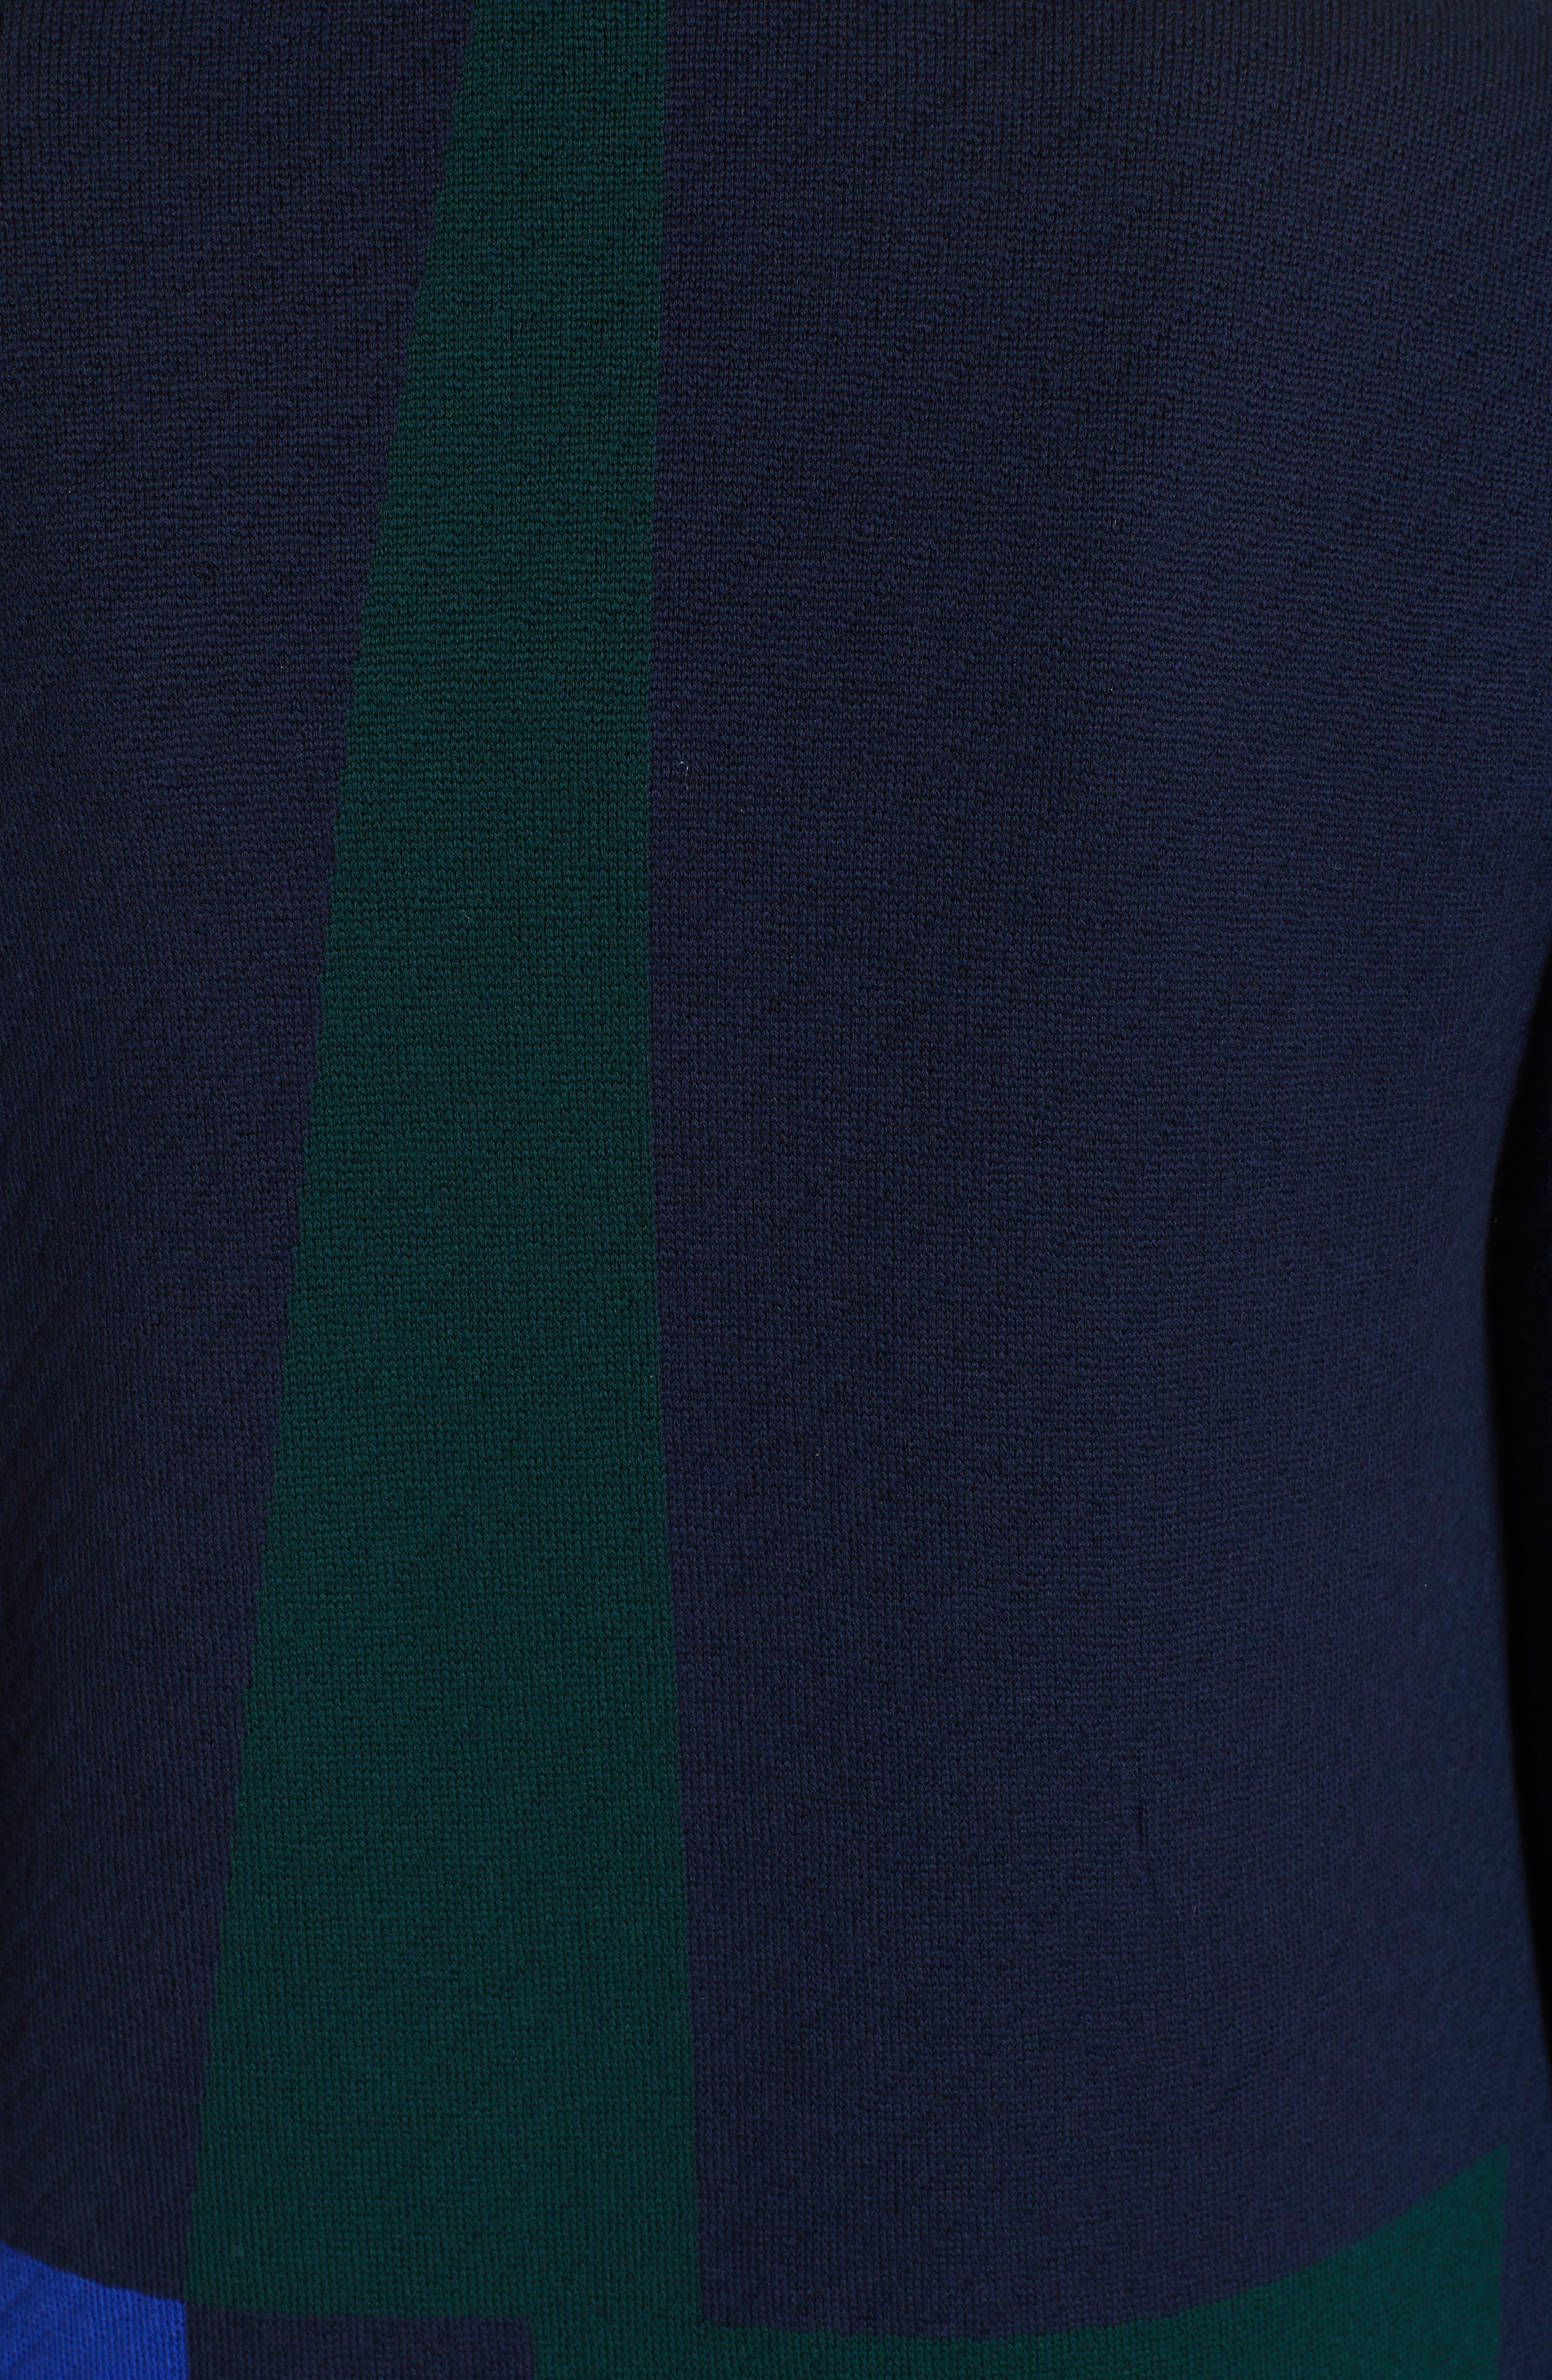 Colorblock Intarsia Wool Twill Jacket,                             Alternate thumbnail 7, color,                             NAVY MULTI